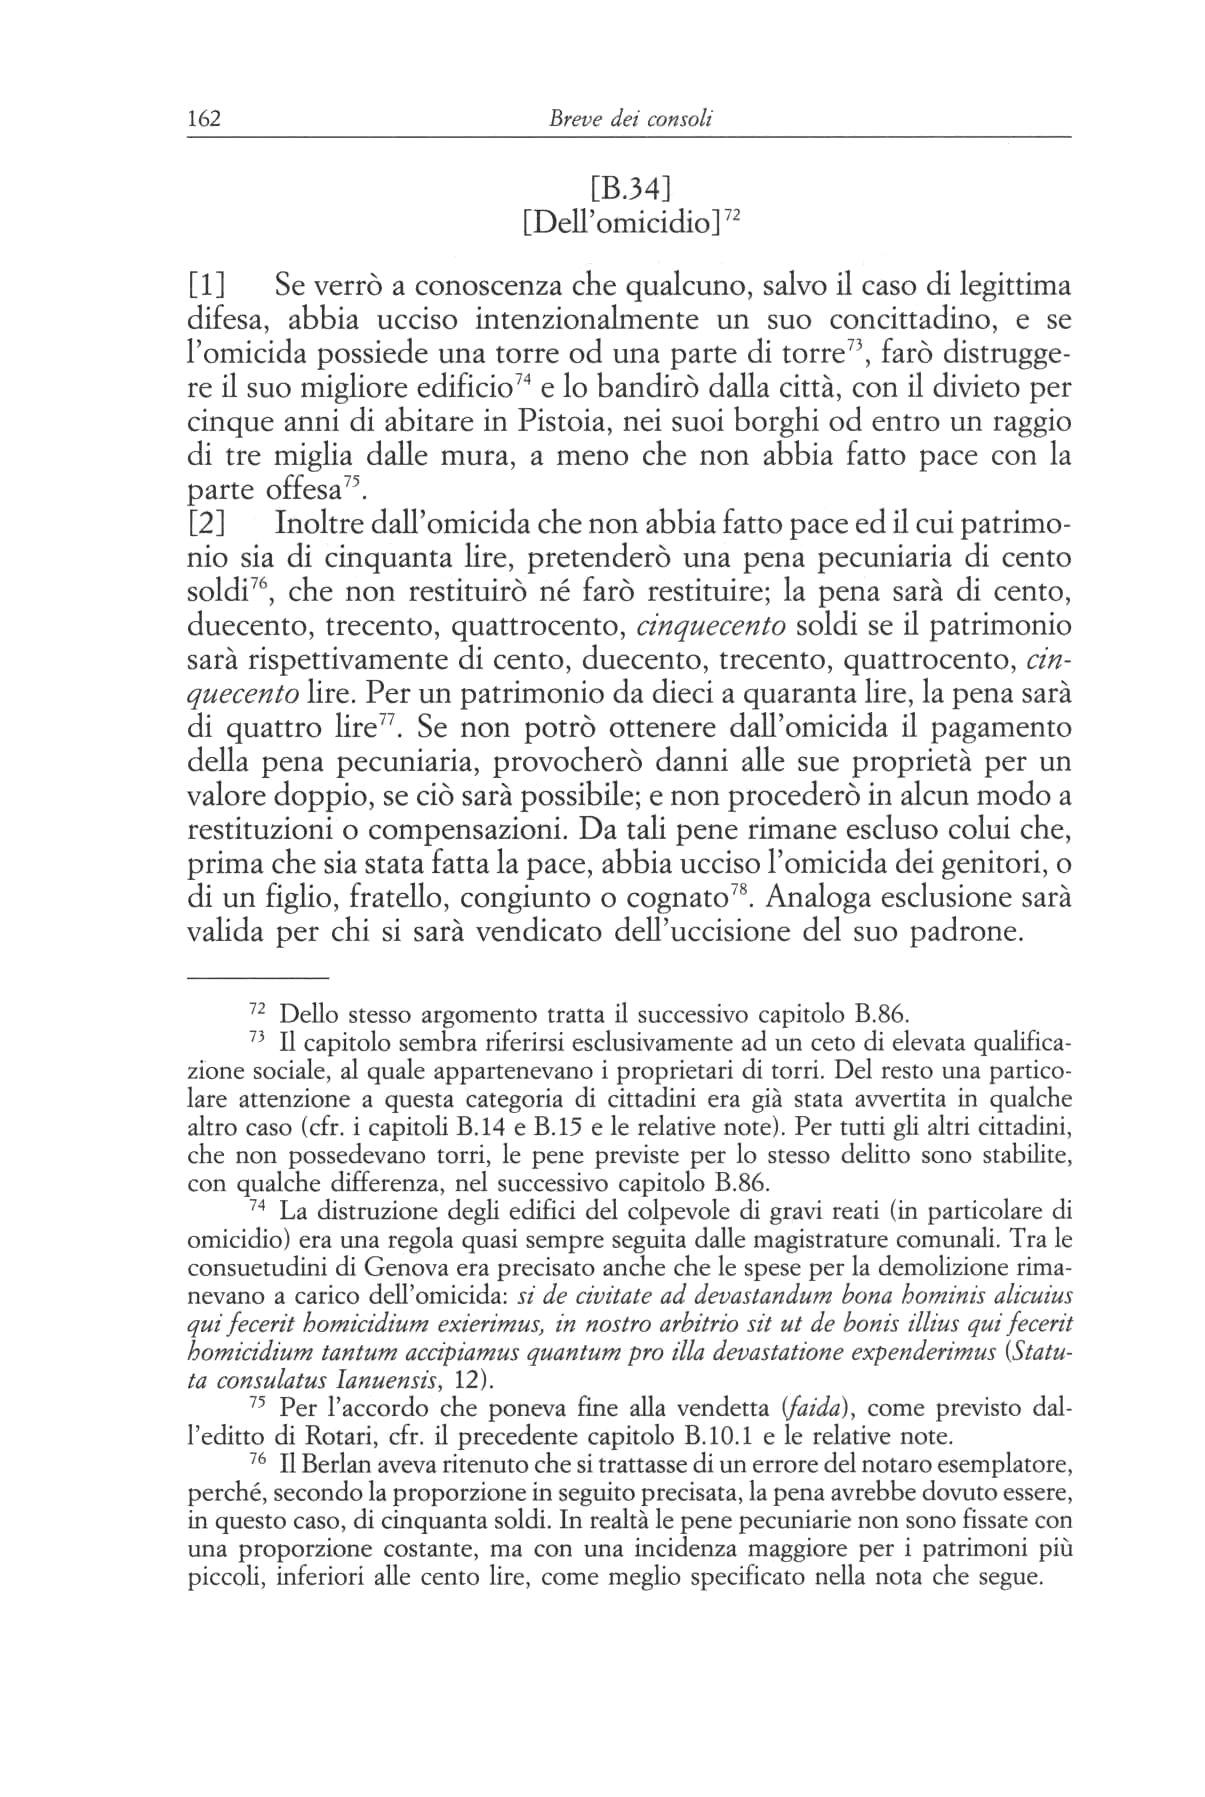 statuti pistoiesi del sec.XII 0162.jpg